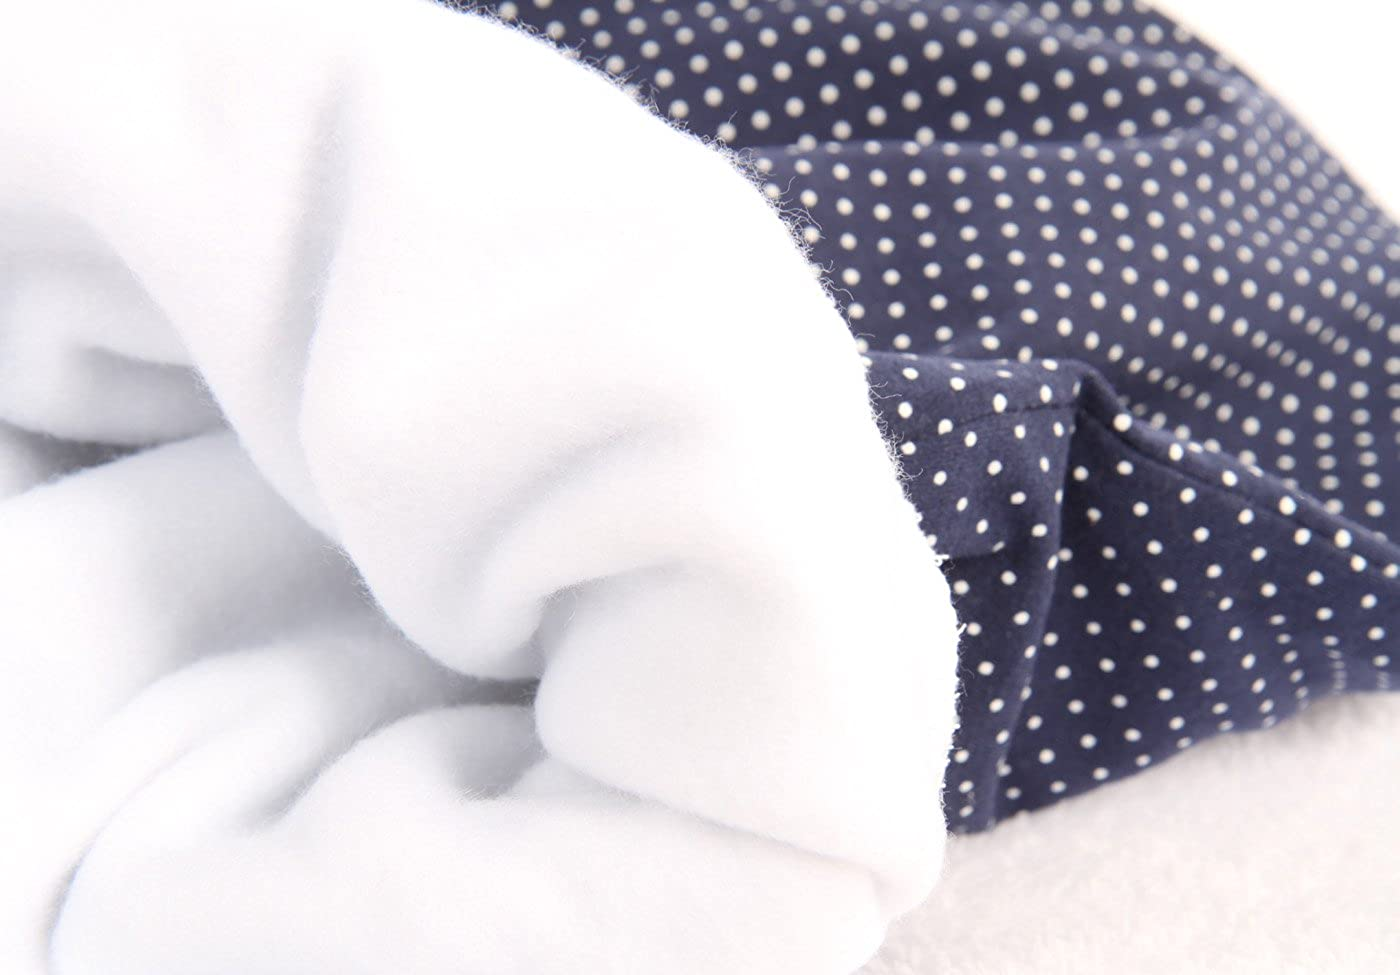 Lilakind Schlafsack Strampelsack Pucksack Fr/ühling//Sommer Punkte Blau Weiss Made in Berlin